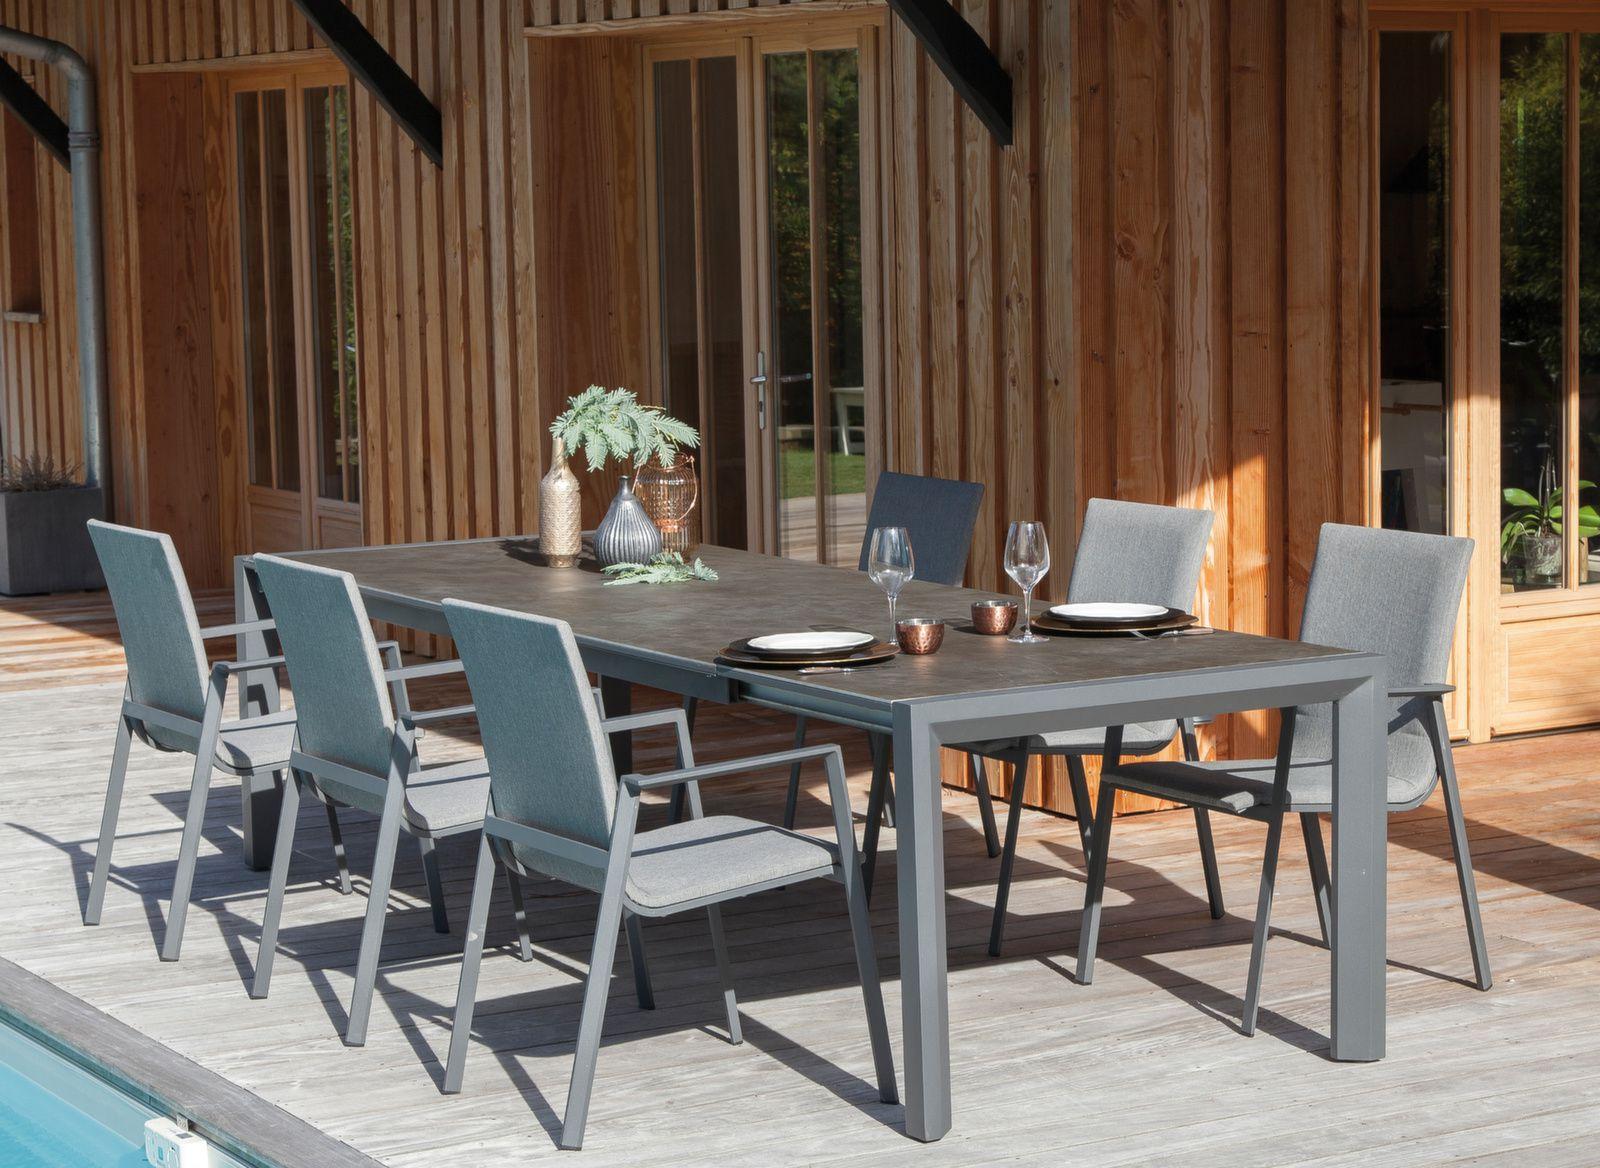 Fauteuil Nova - Chaises et fauteuils de jardin - Salon de jardin ...